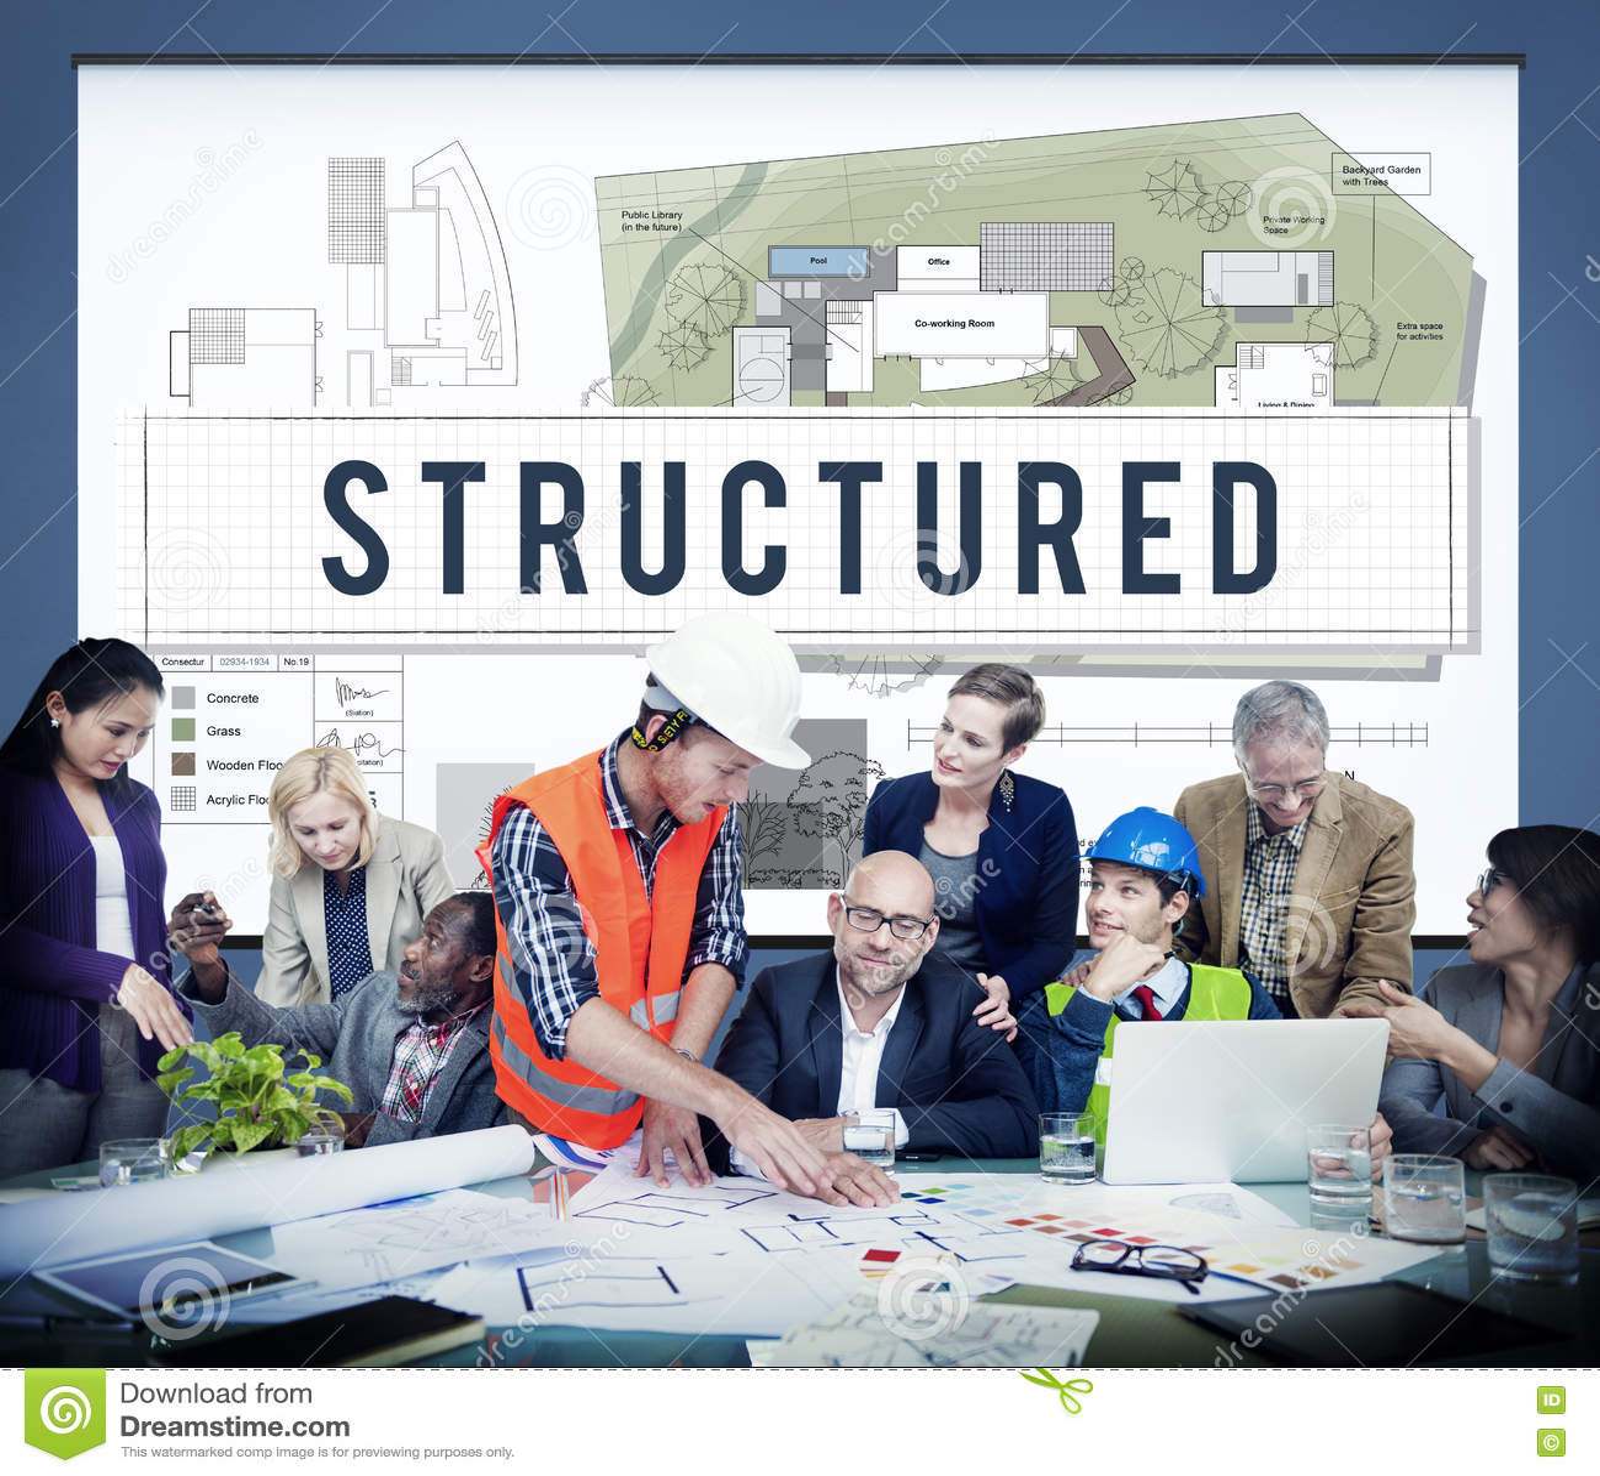 Structured Building Construction Design Plan Concept